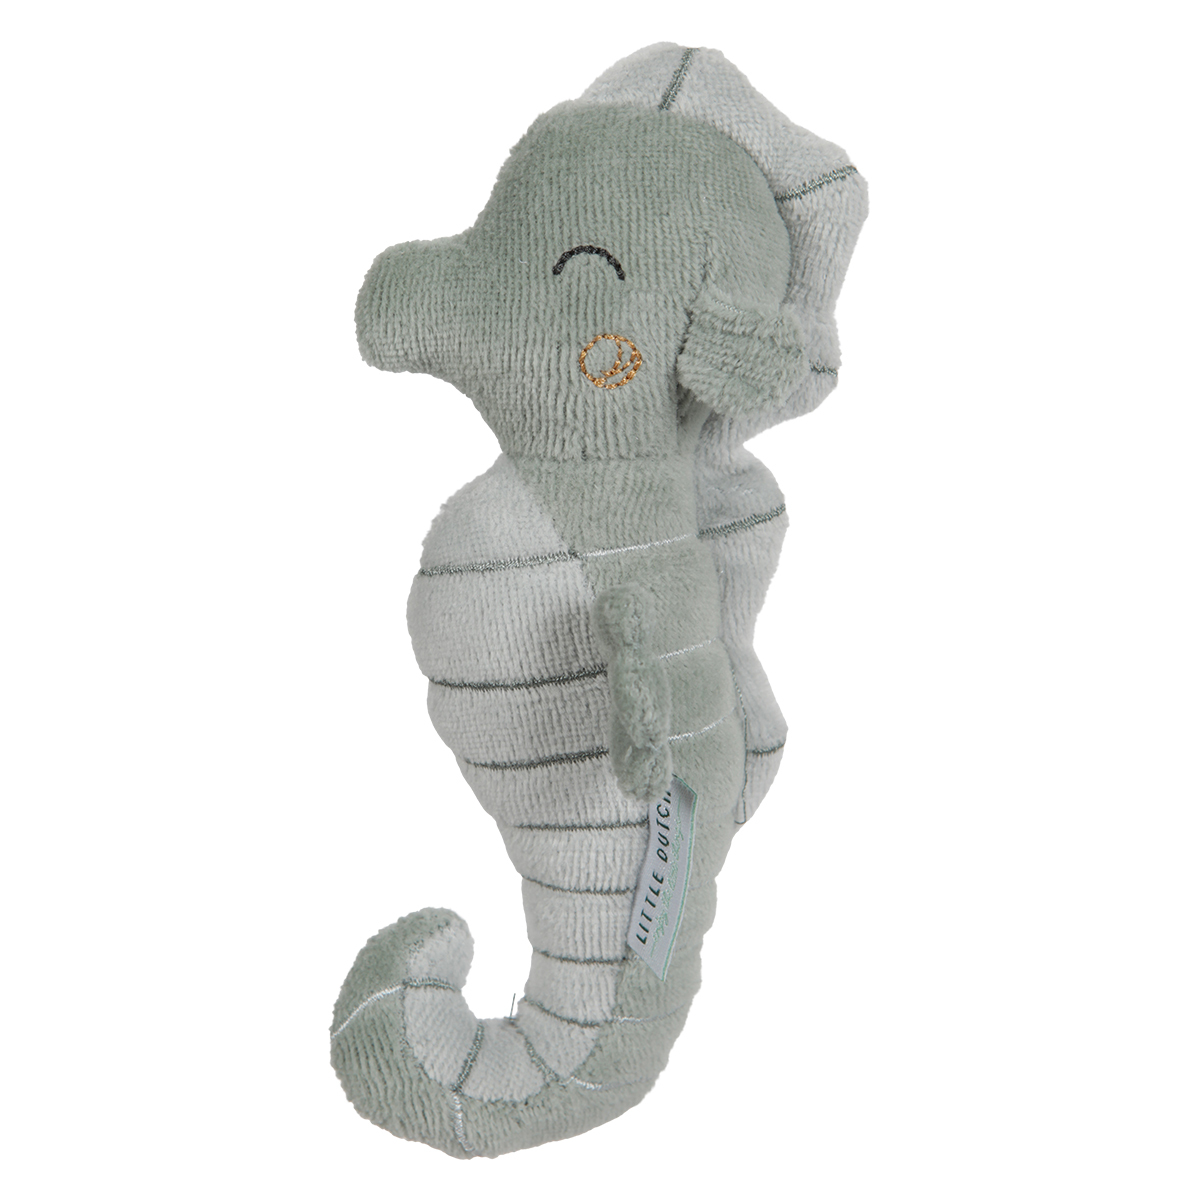 Hochet Hochet Hippocampe Ocean - Menthe Hochet Hippocampe Ocean - Menthe